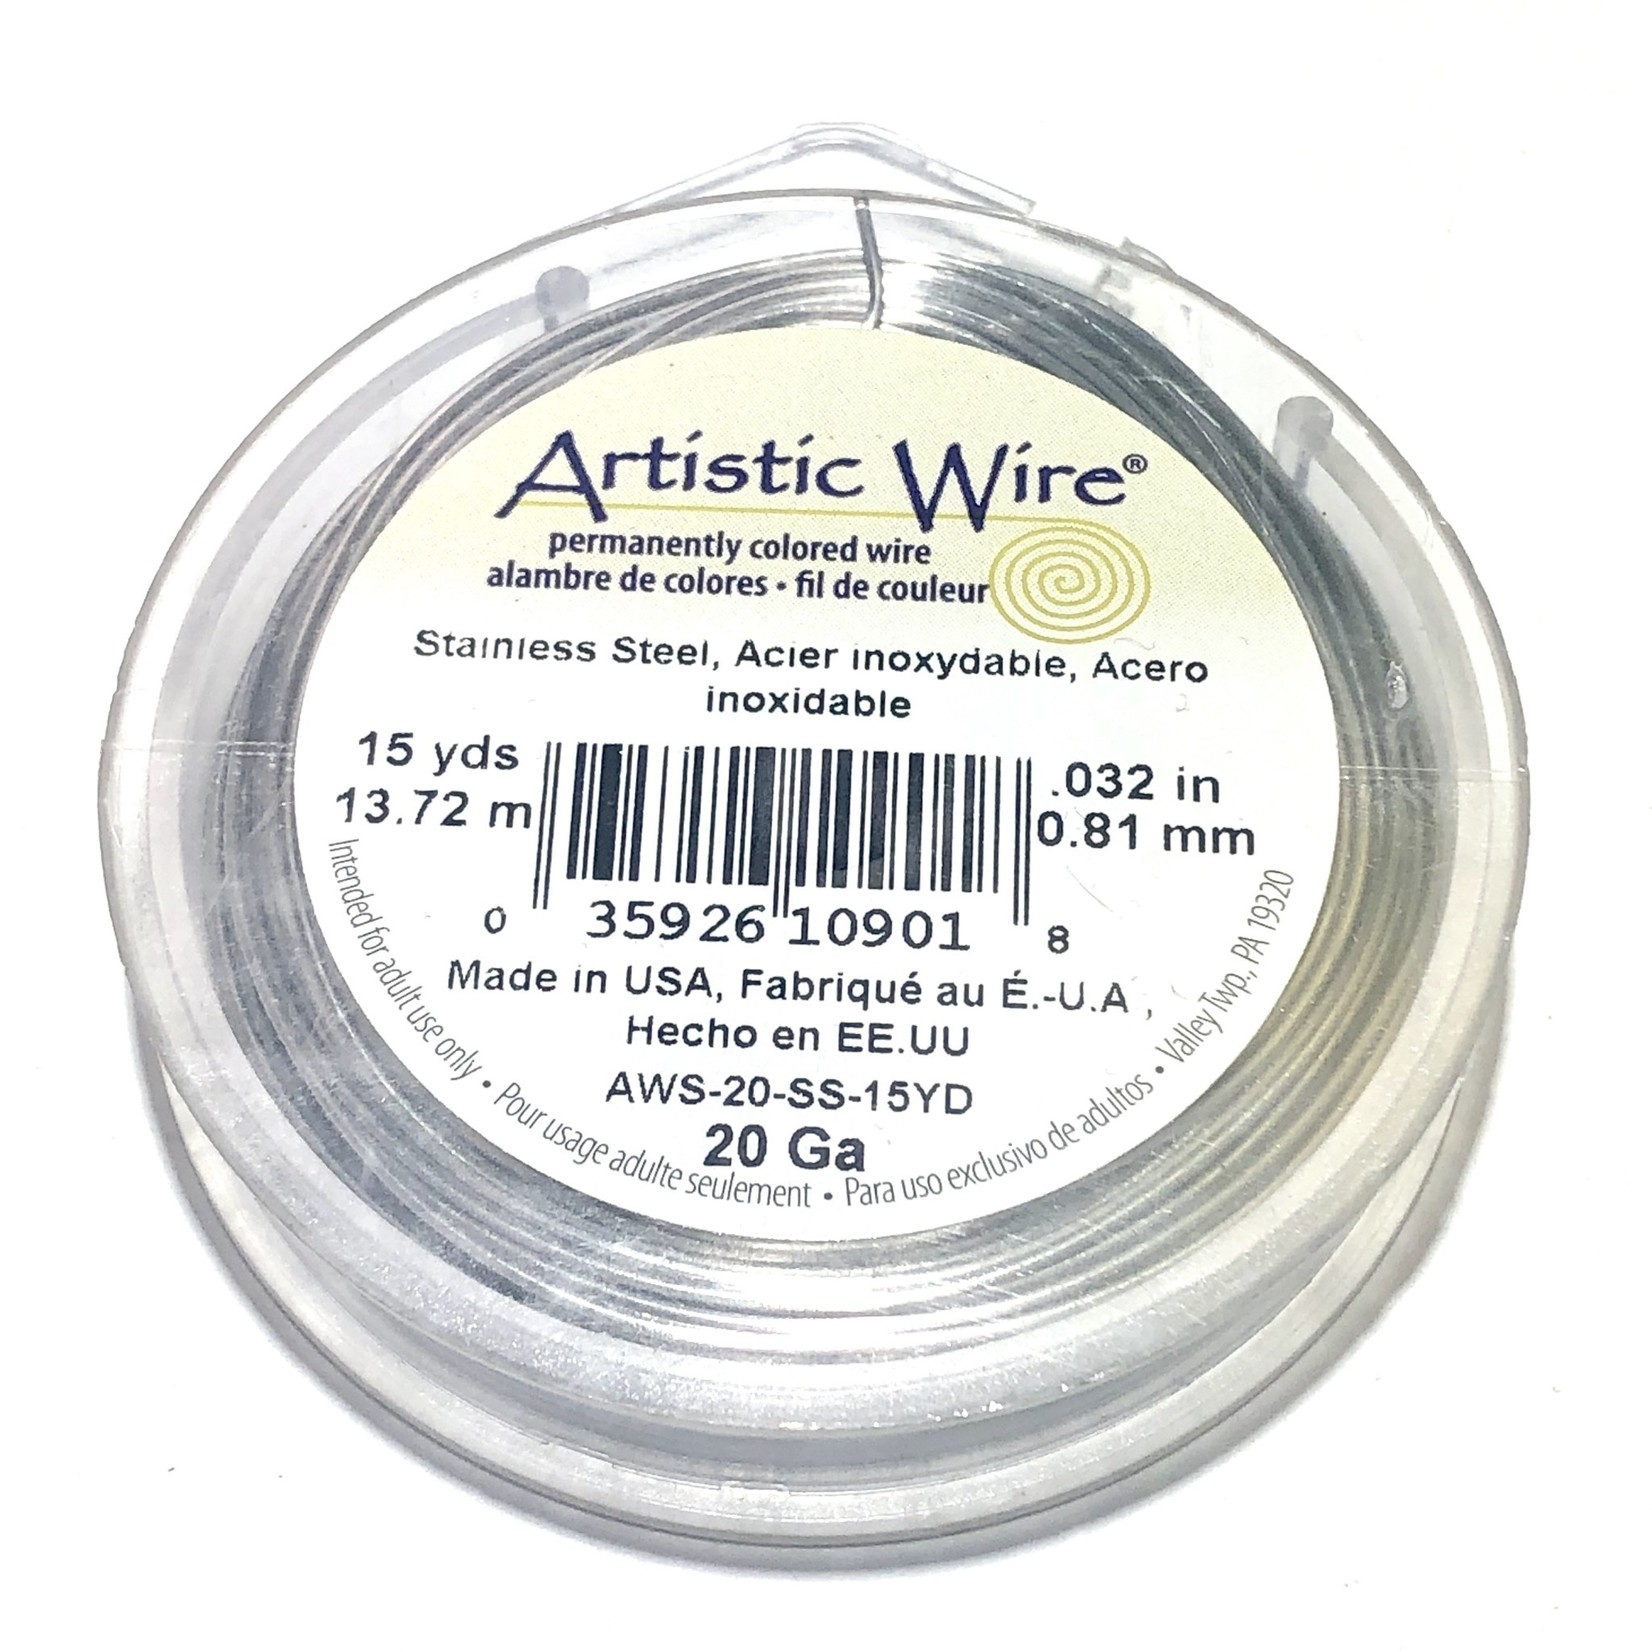 Artistic Wire Stainless Steel 20 Gauge 15 Yd